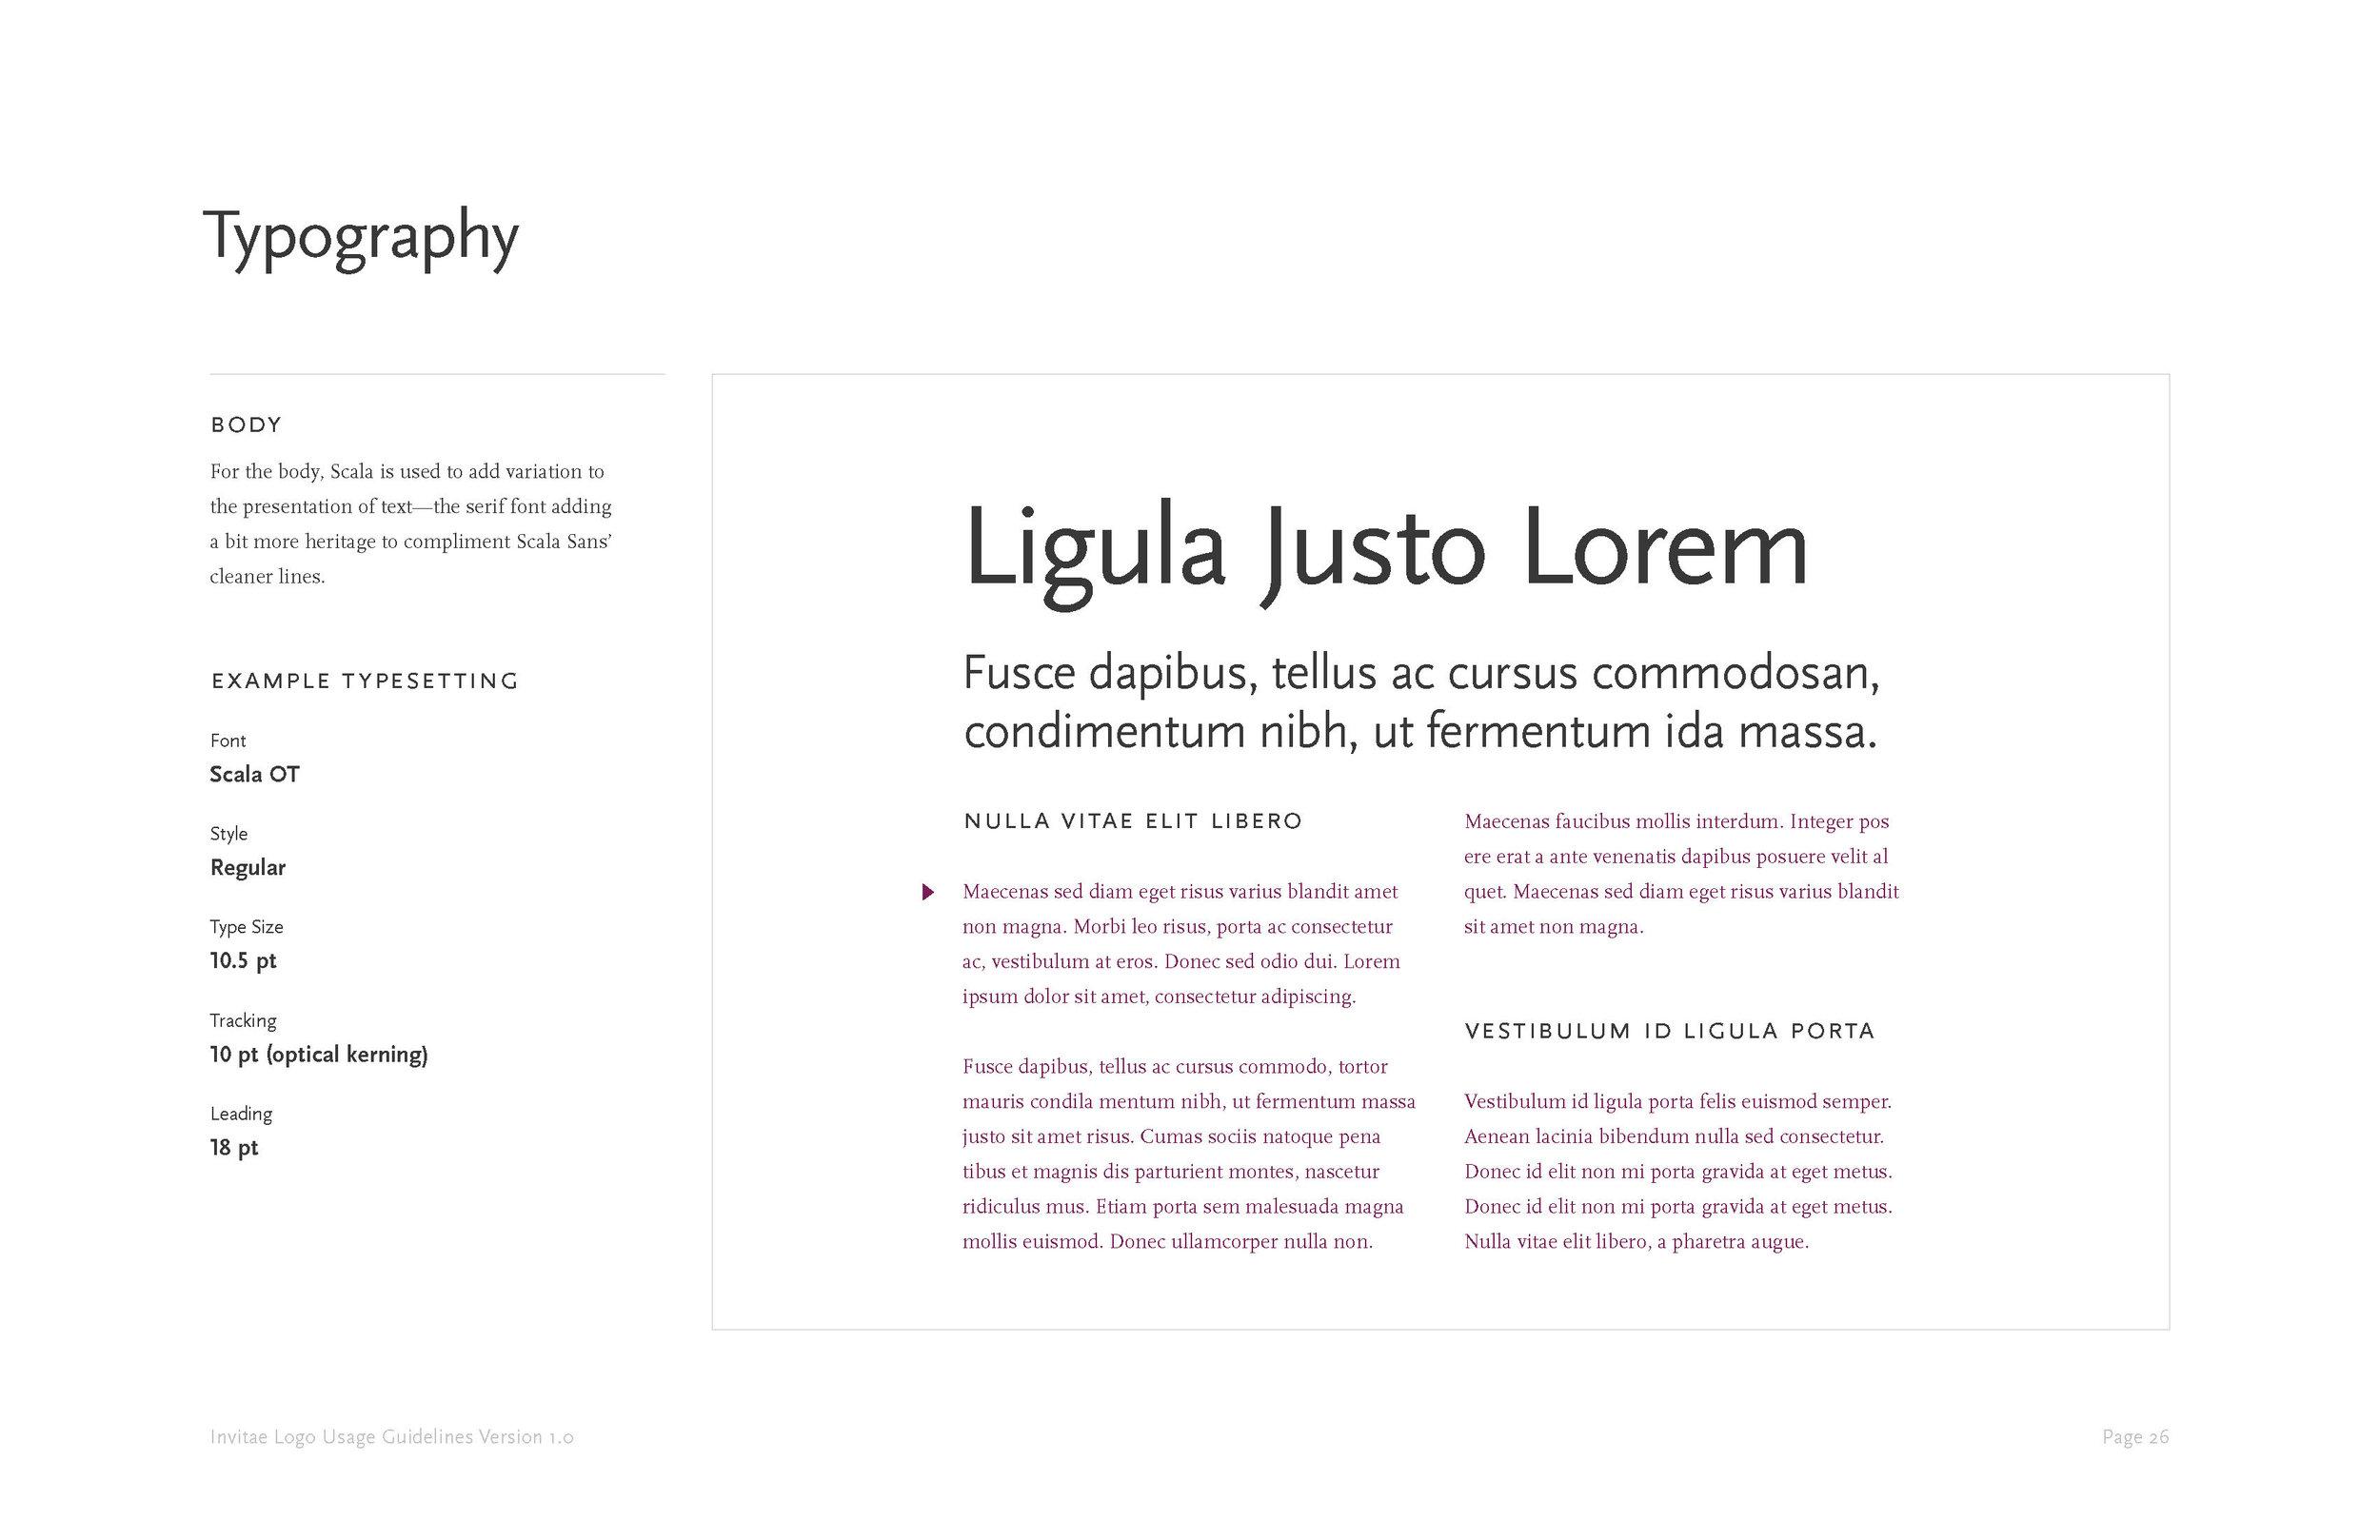 Invitae_logo_guidelines_Page_28.jpg